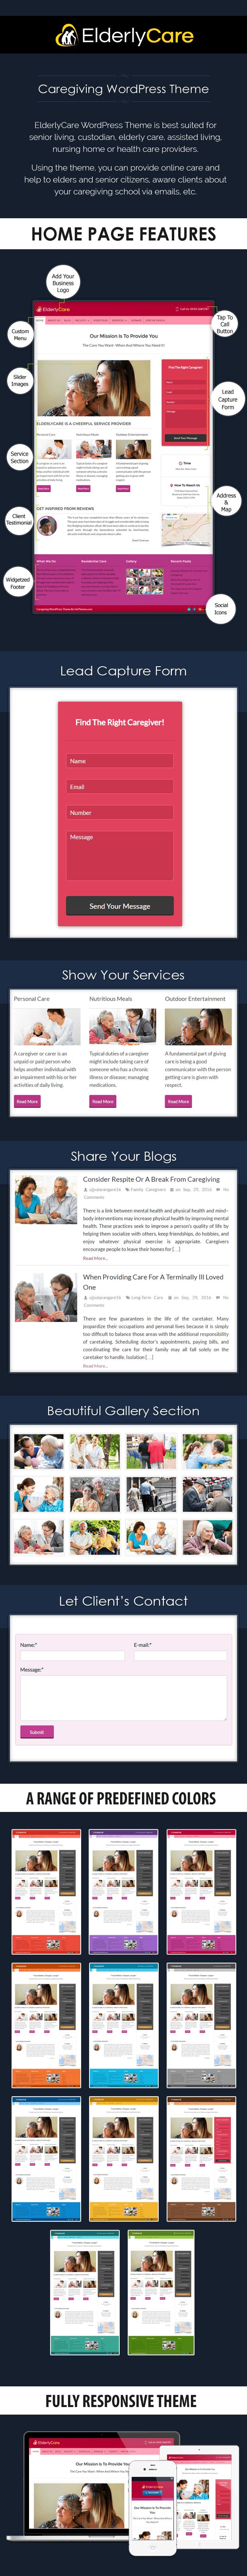 Caregiving WordPress Theme Sales Page Preview